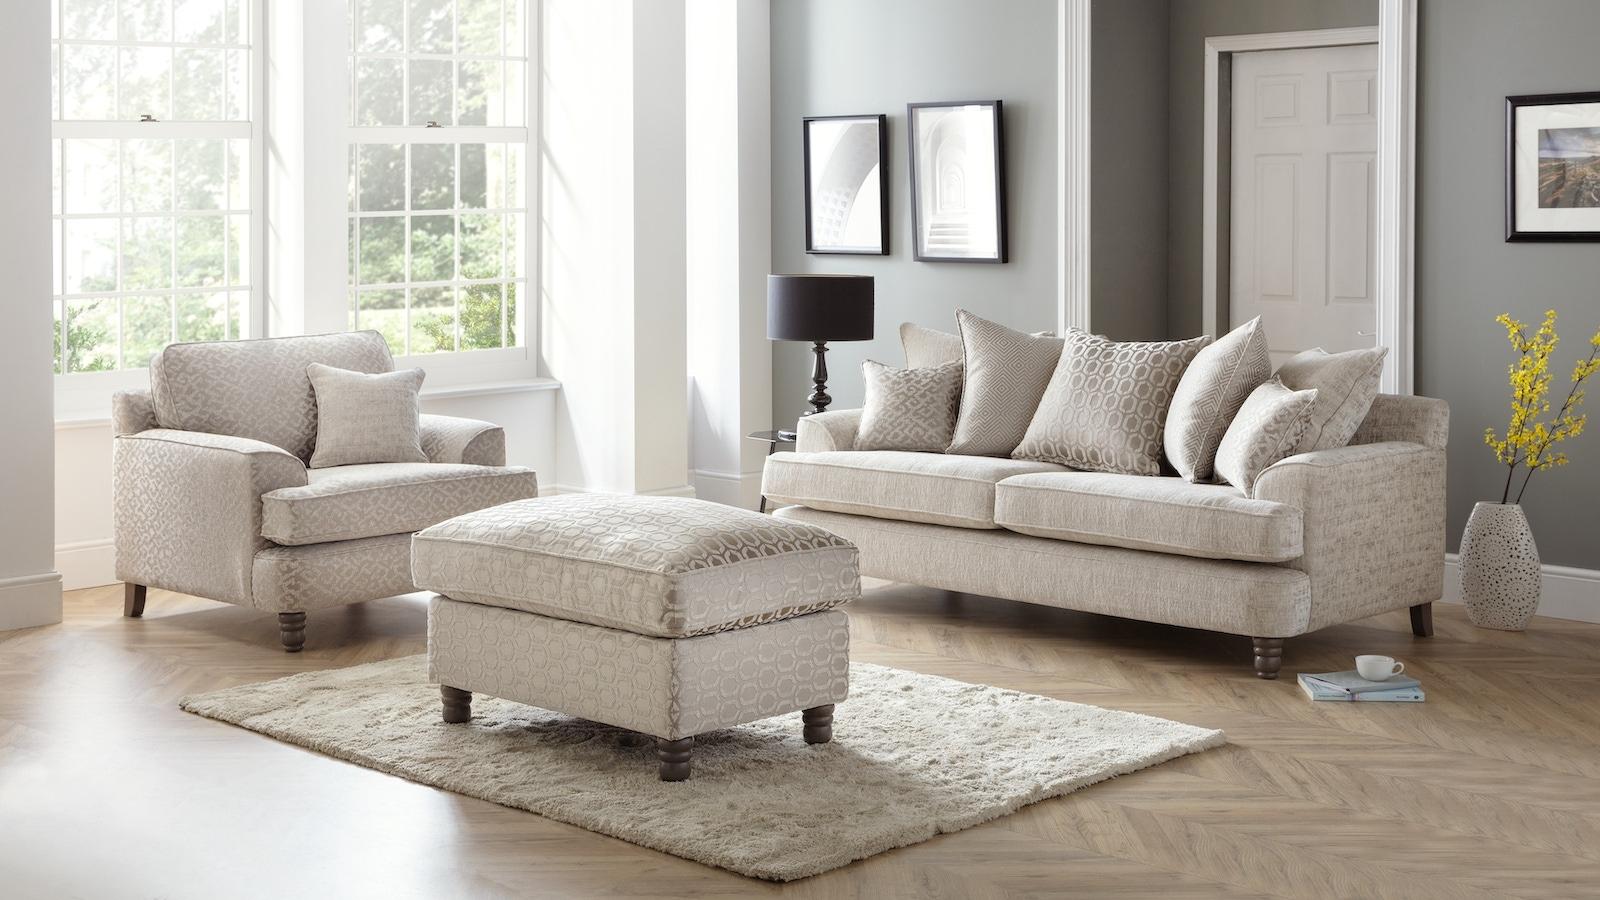 Murano Sofa and Chair set